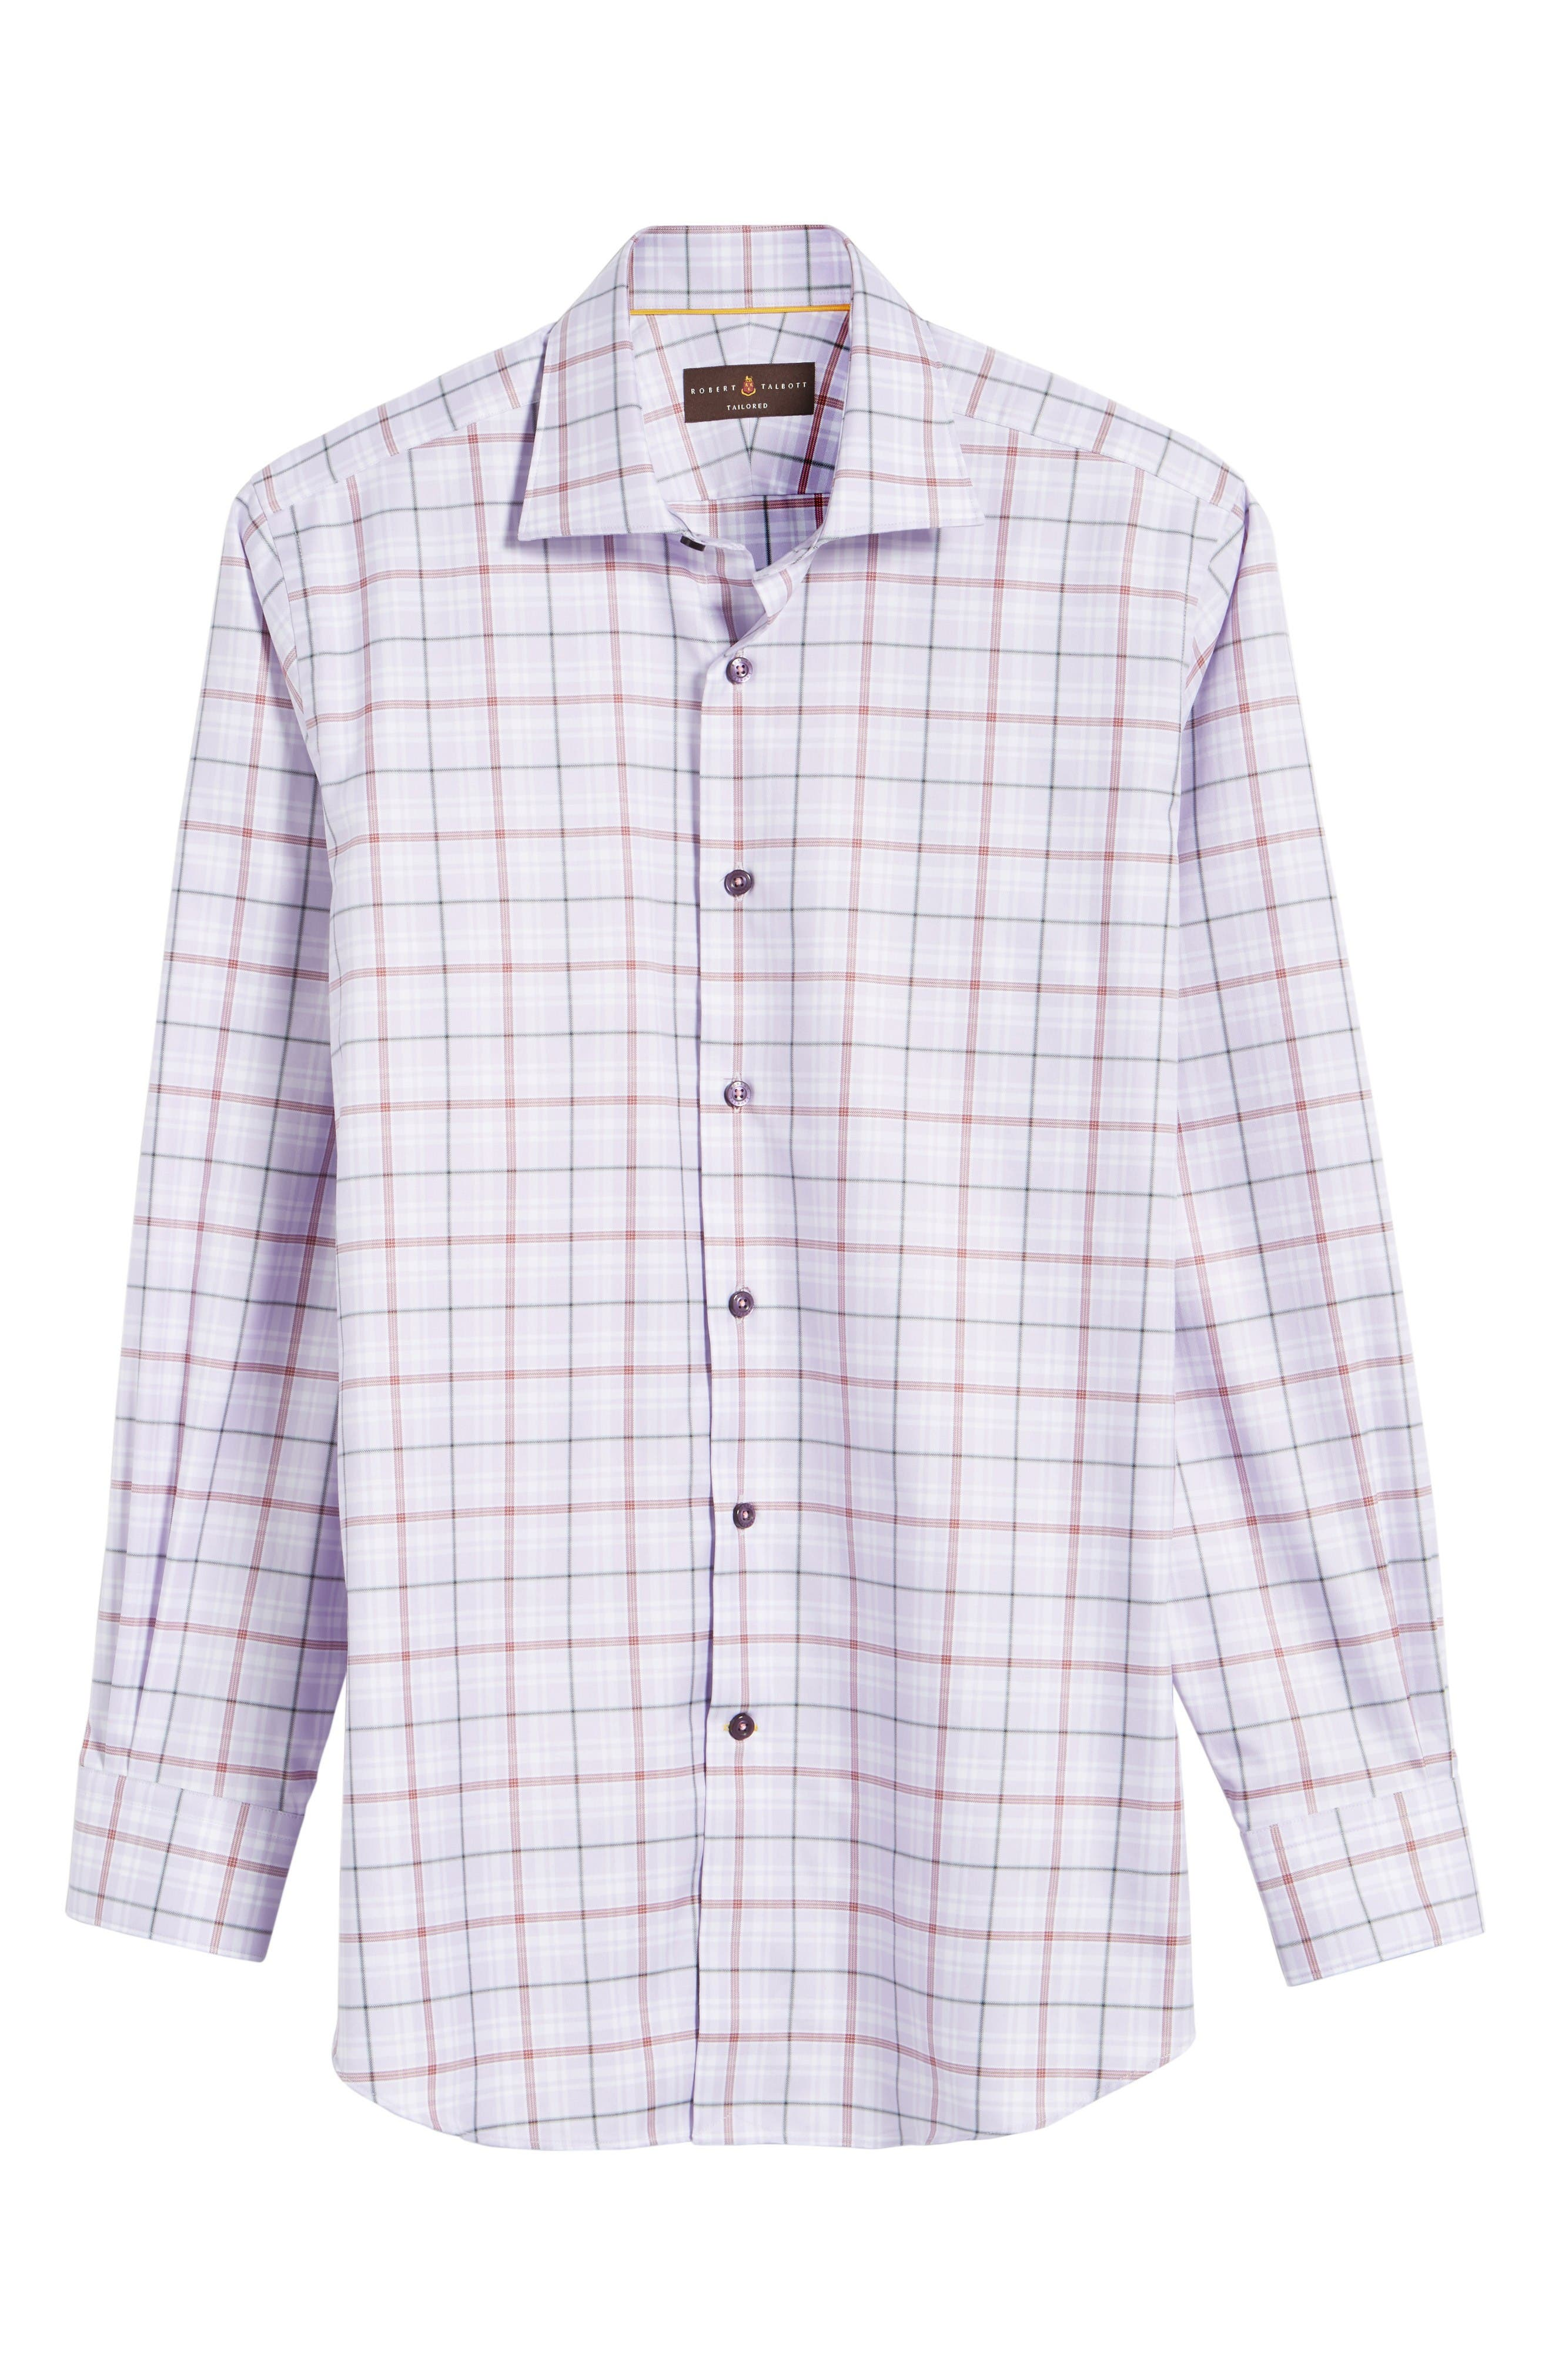 Crespi IV Tailored Fit Sport Shirt,                             Alternate thumbnail 6, color,                             Lavender